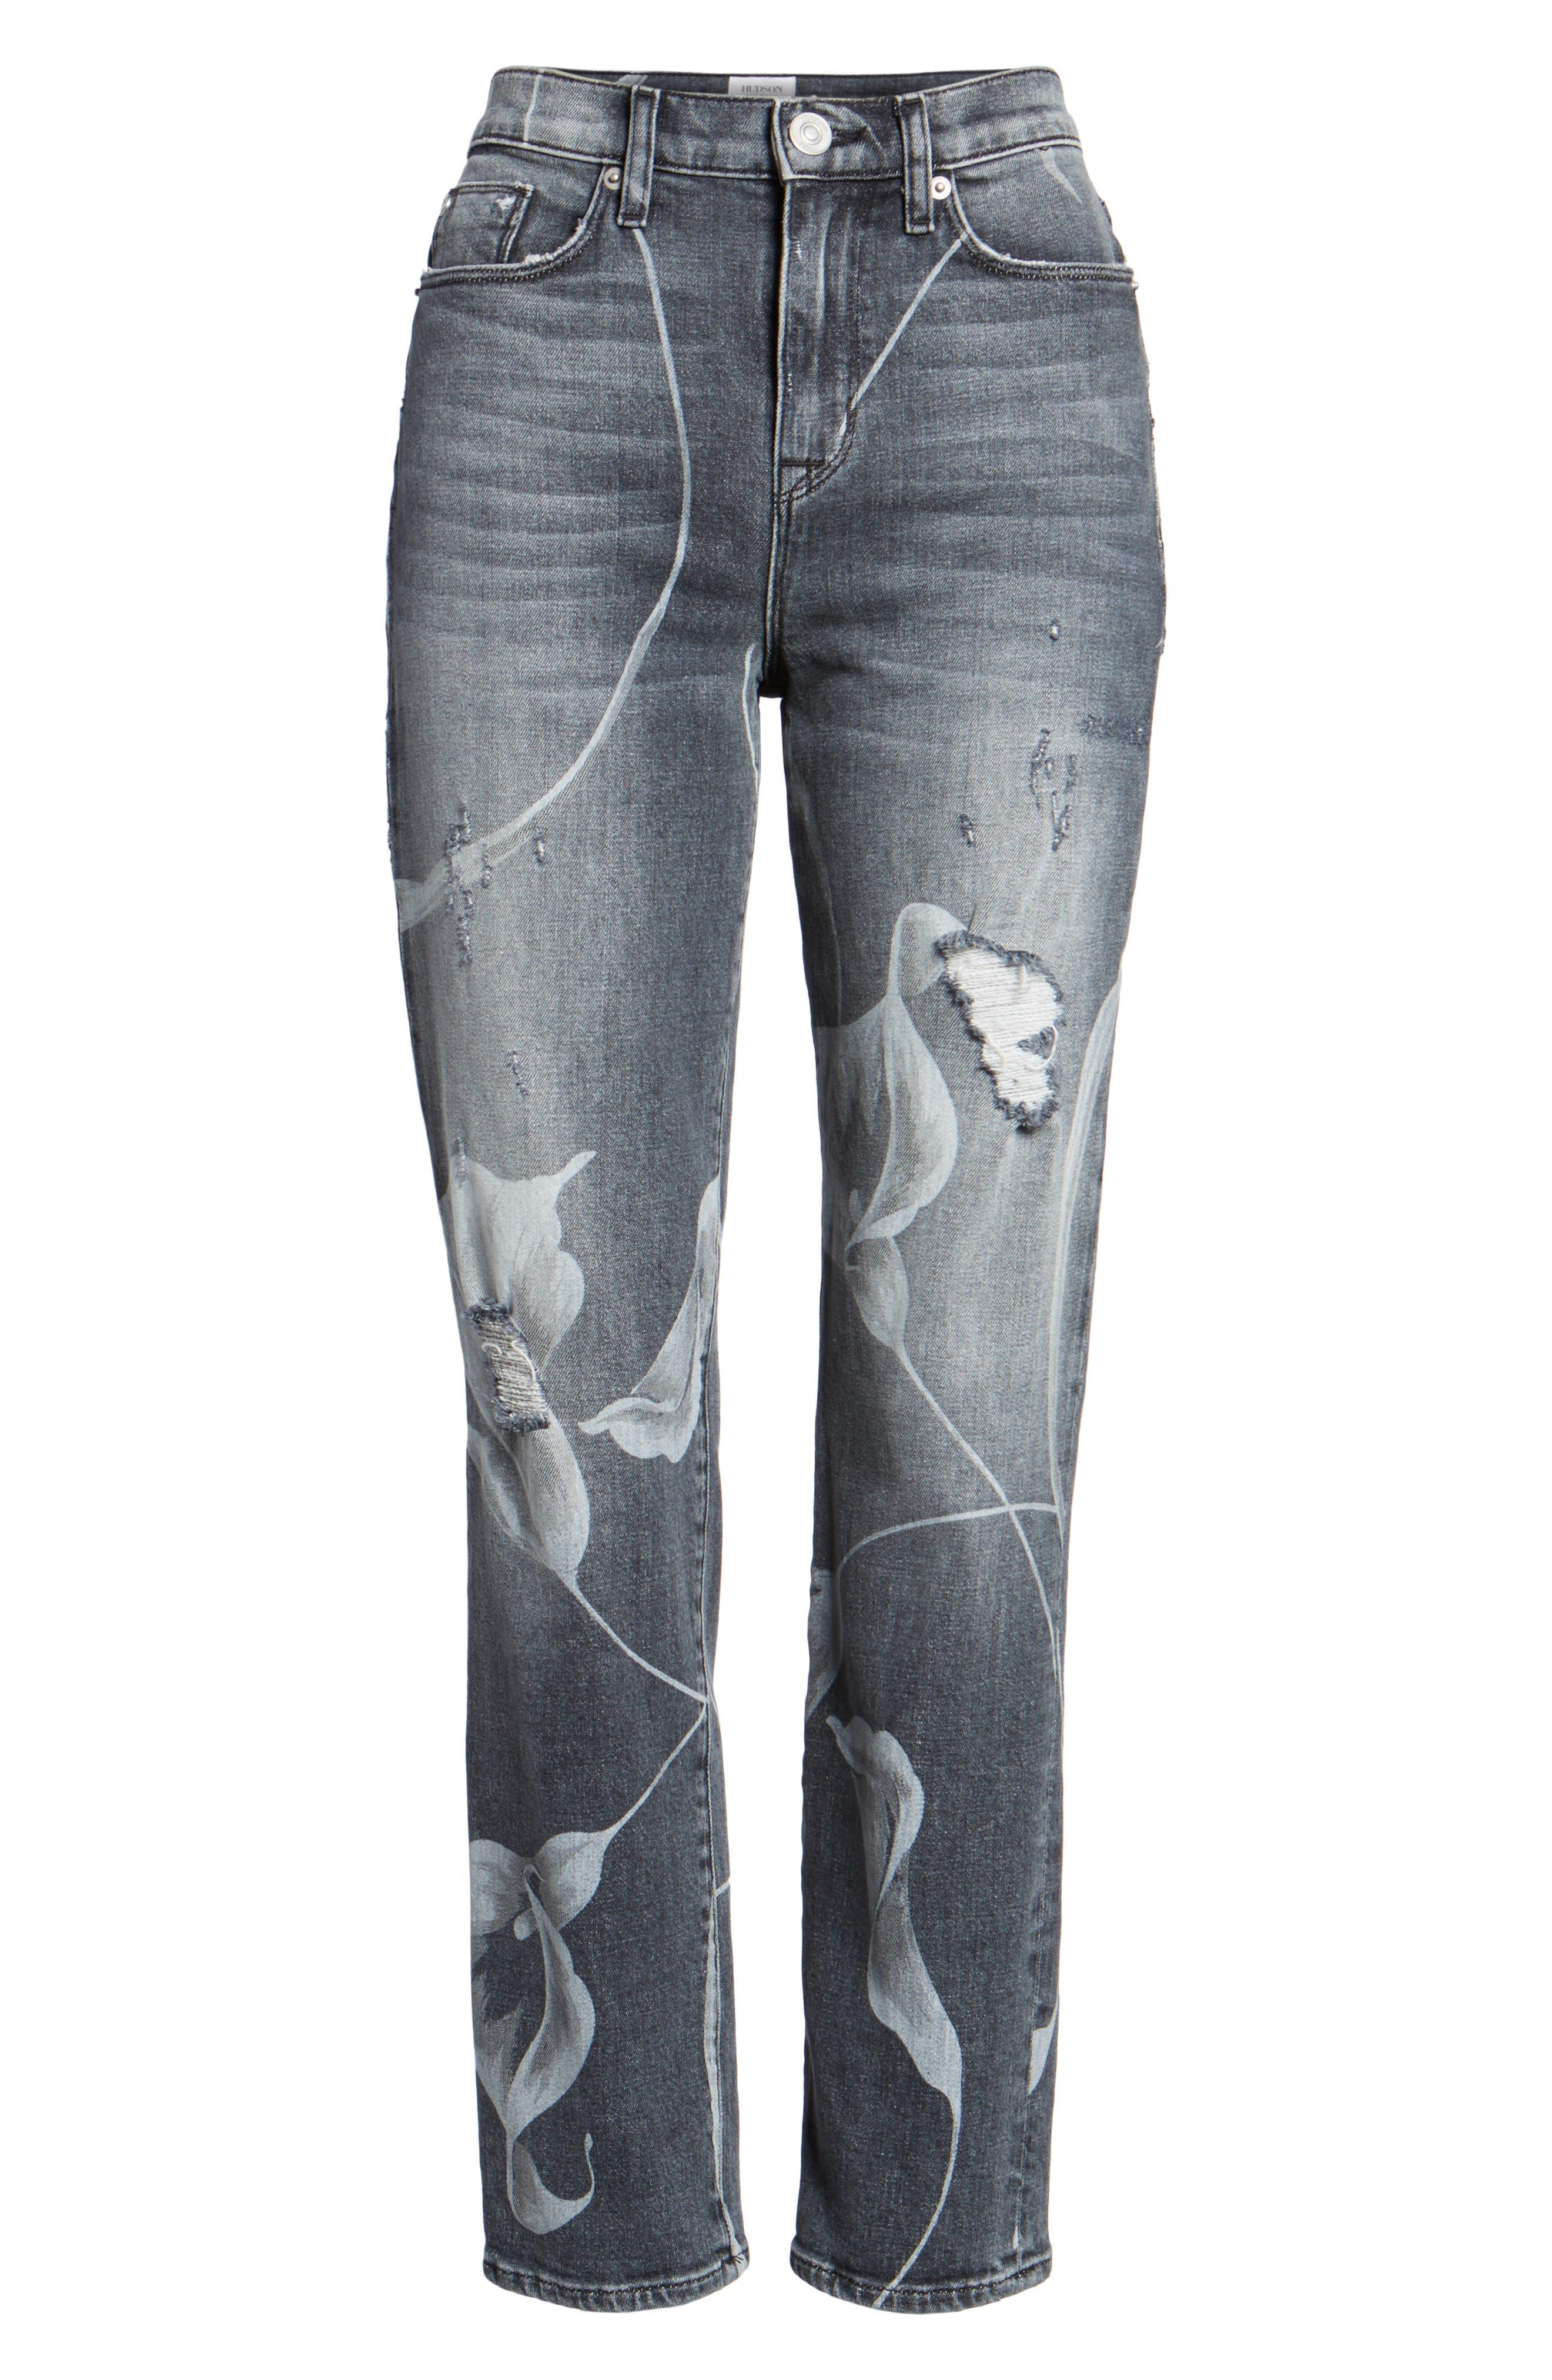 Zoeey High Waist Crop Straight Leg Jeans,                             Alternate thumbnail 6, color,                             Noir In Bloom